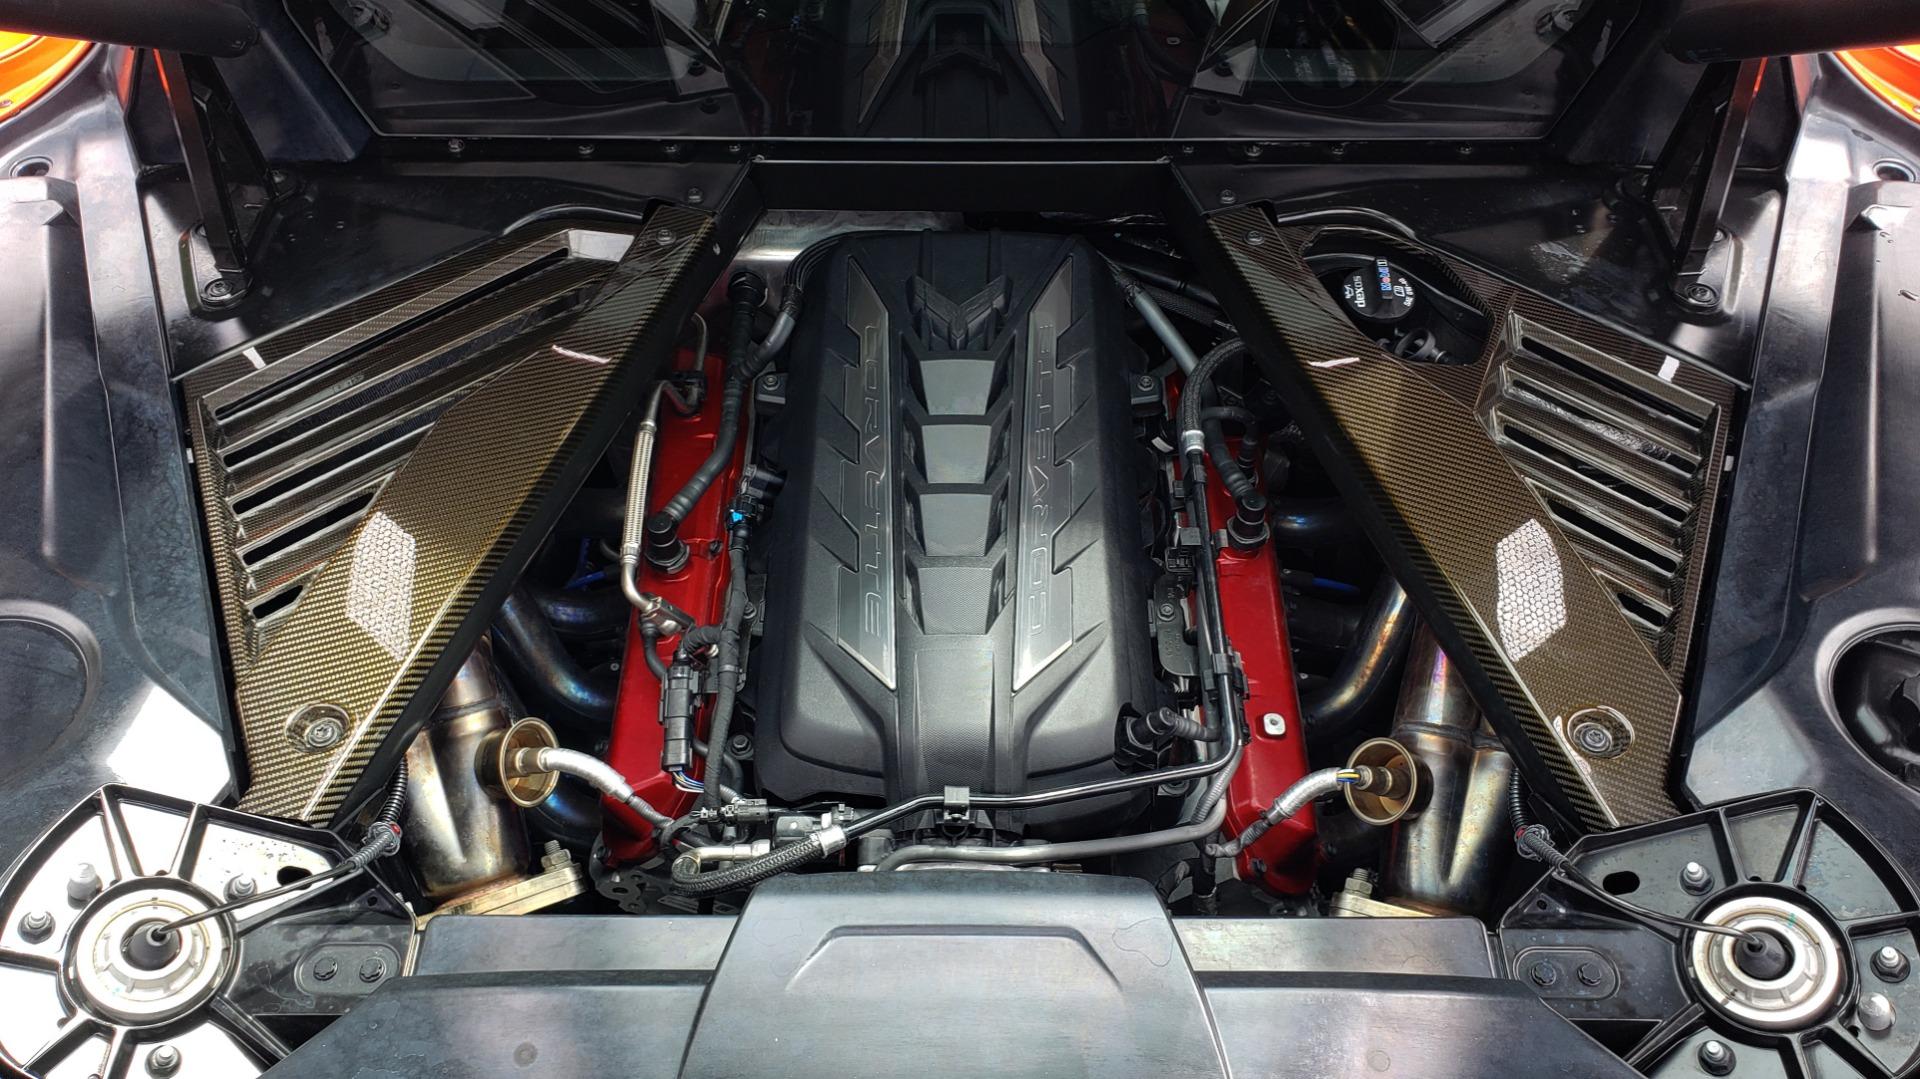 Used 2020 Chevrolet CORVETTE C8 STINGRAY 2LT / 6.2L V8 / 8-SPD AUTO / NAV / BOSE / REARVIEW / DATA RECOR for sale Sold at Formula Imports in Charlotte NC 28227 21